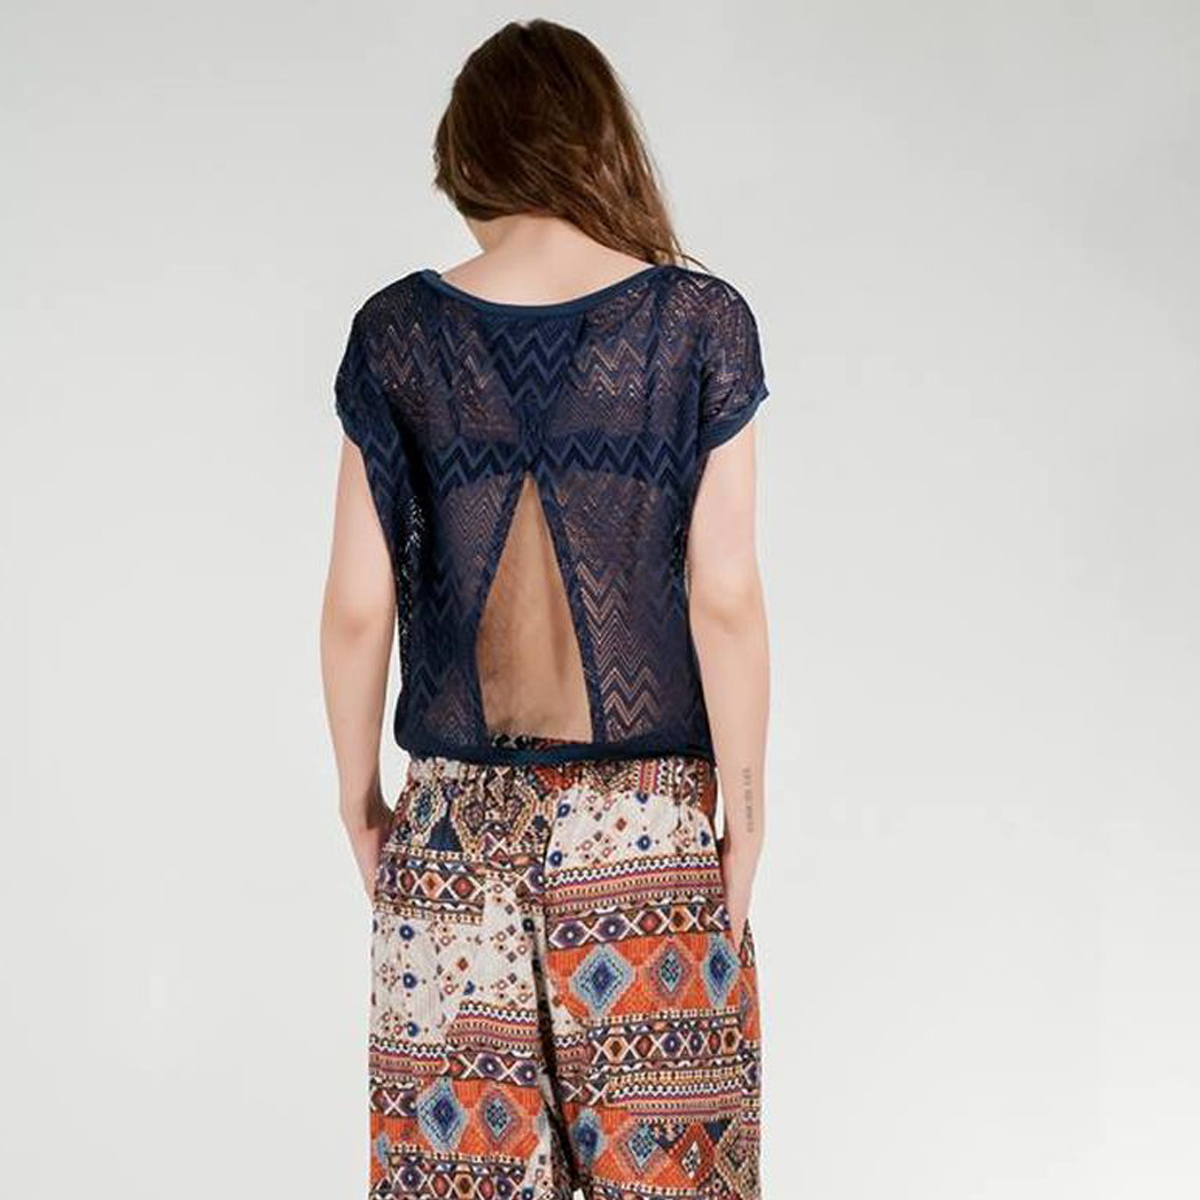 9c530c28f28f Μπλούζα δαντέλα ανοιχτή πλάτη - Dressme